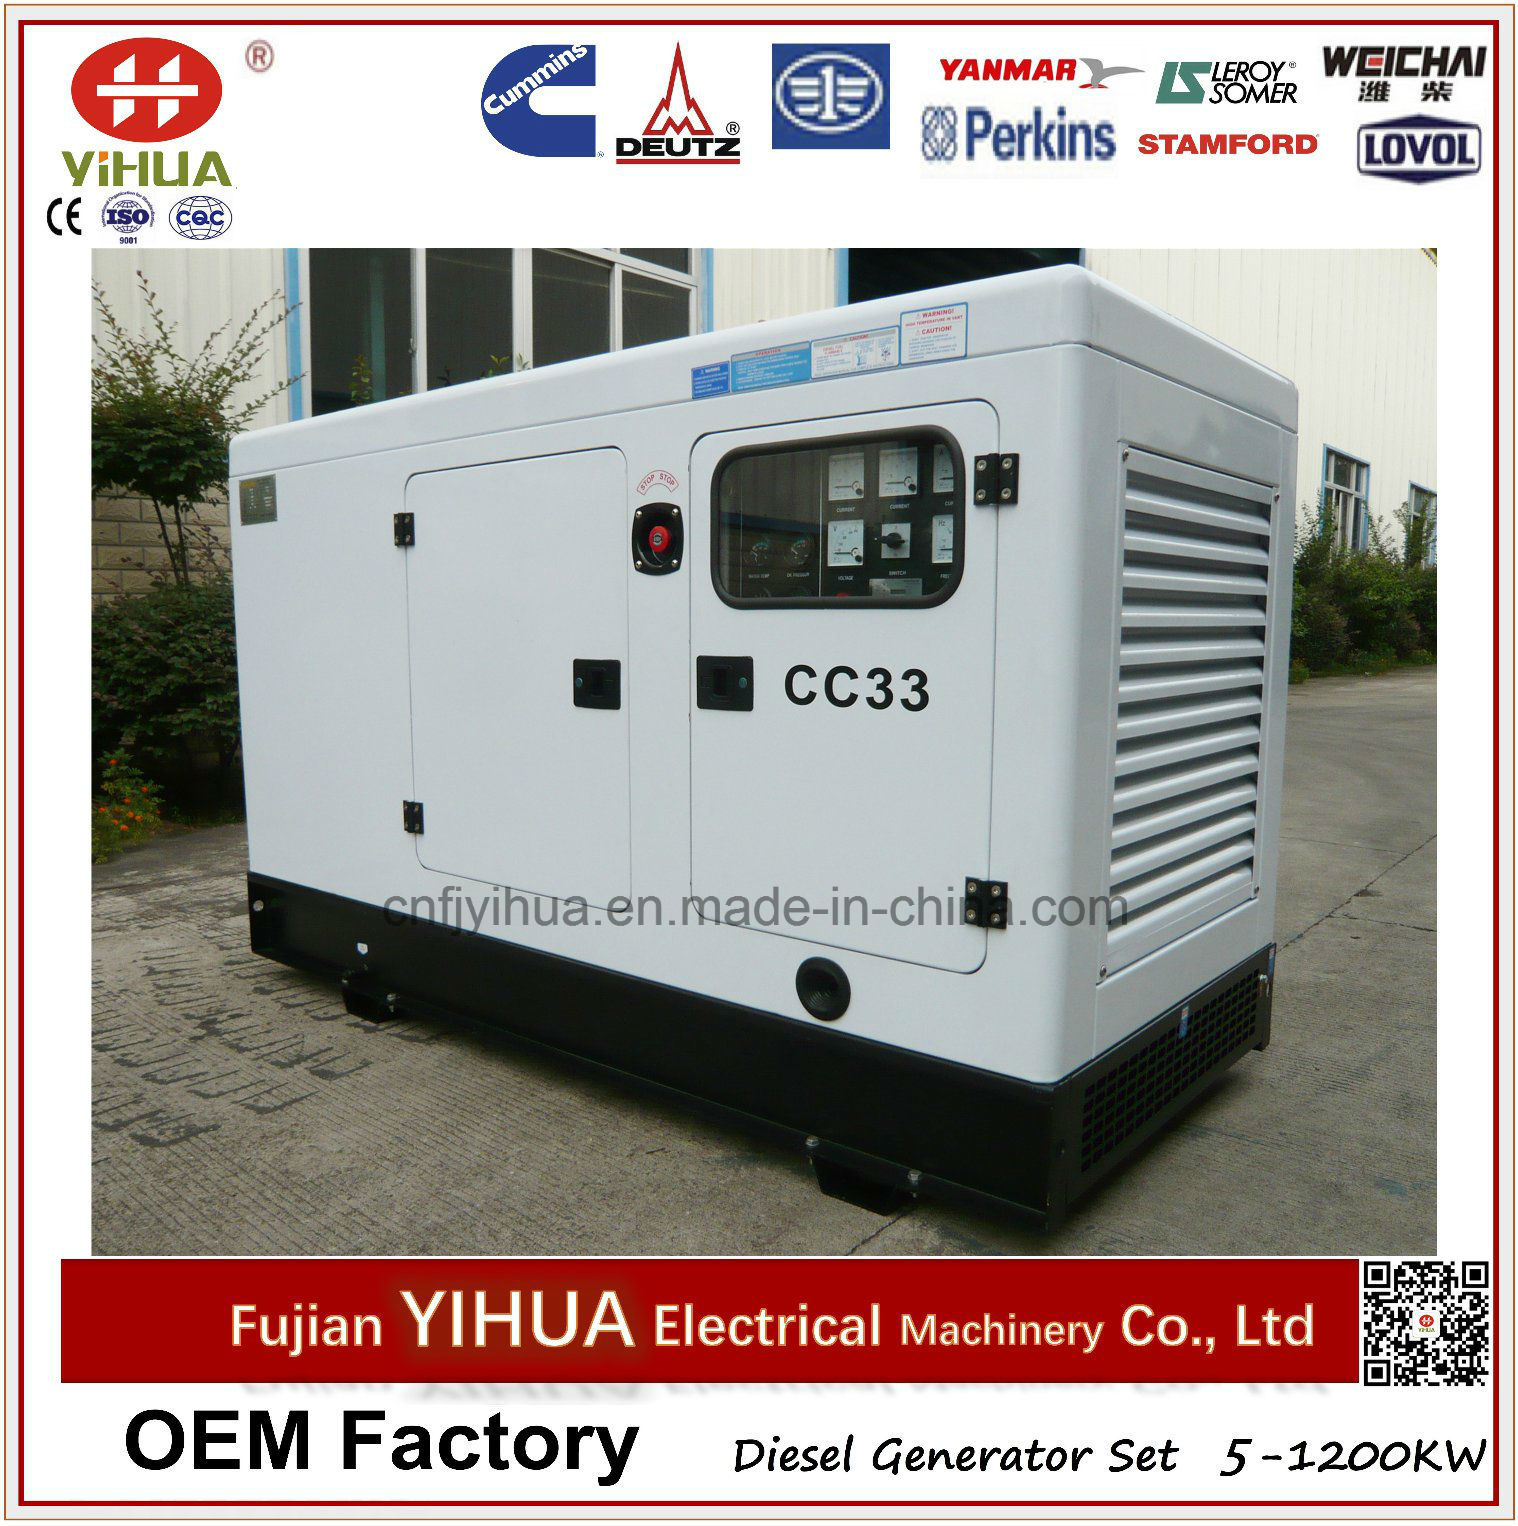 China 30kw 375kva Silent Diesel Generator Set Powered By Cummins Transfer Switch Wiringautomatic Suyang Atsautomatic Engine 4bt39